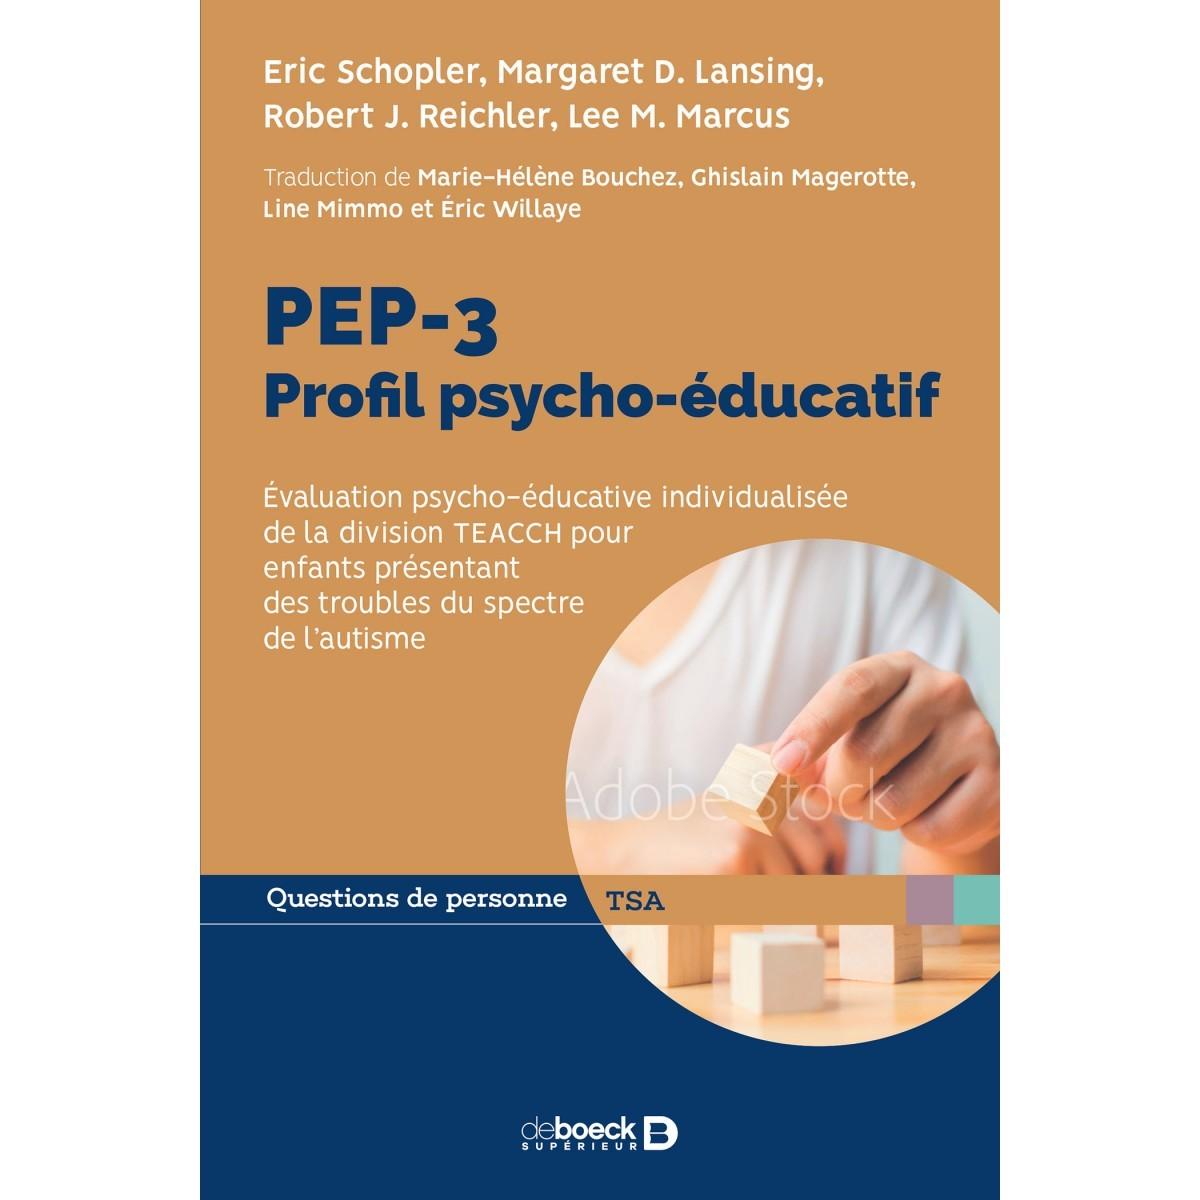 PEP 3 : profil psycho-éducatif